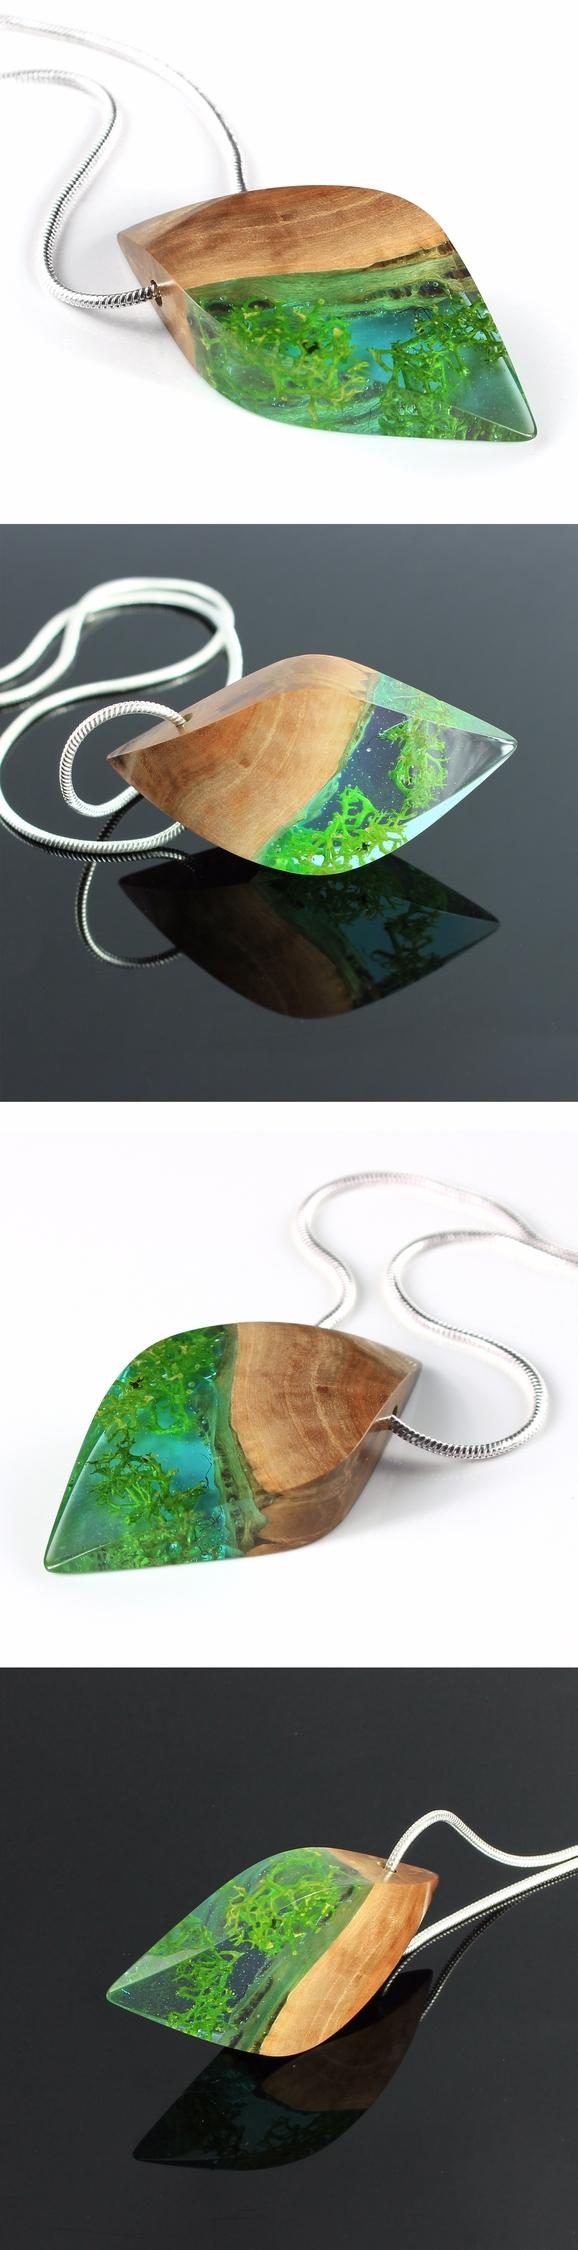 working designs attempt ocean i - woodallgood | ello